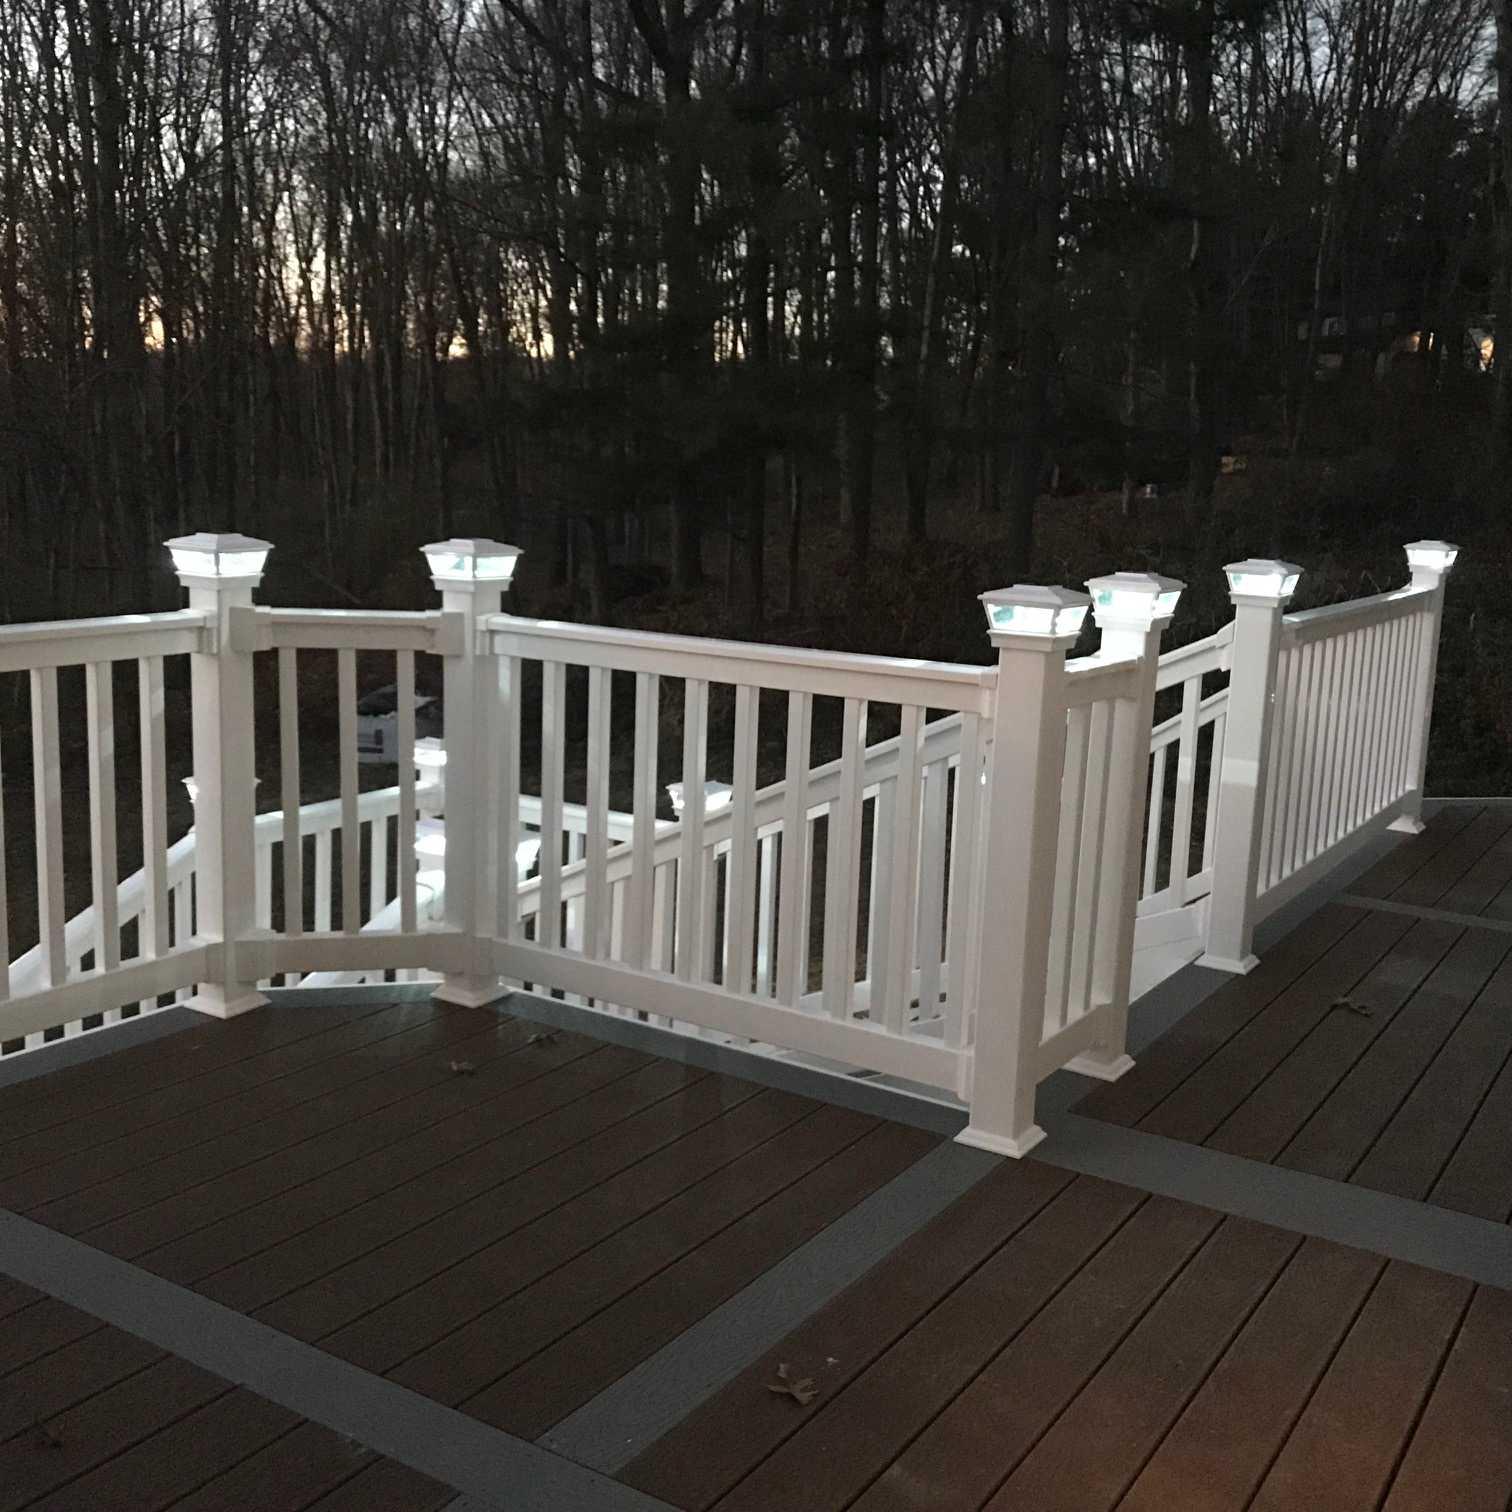 Custom Designed Deck - Vinyl Railings, Solar Post Caps